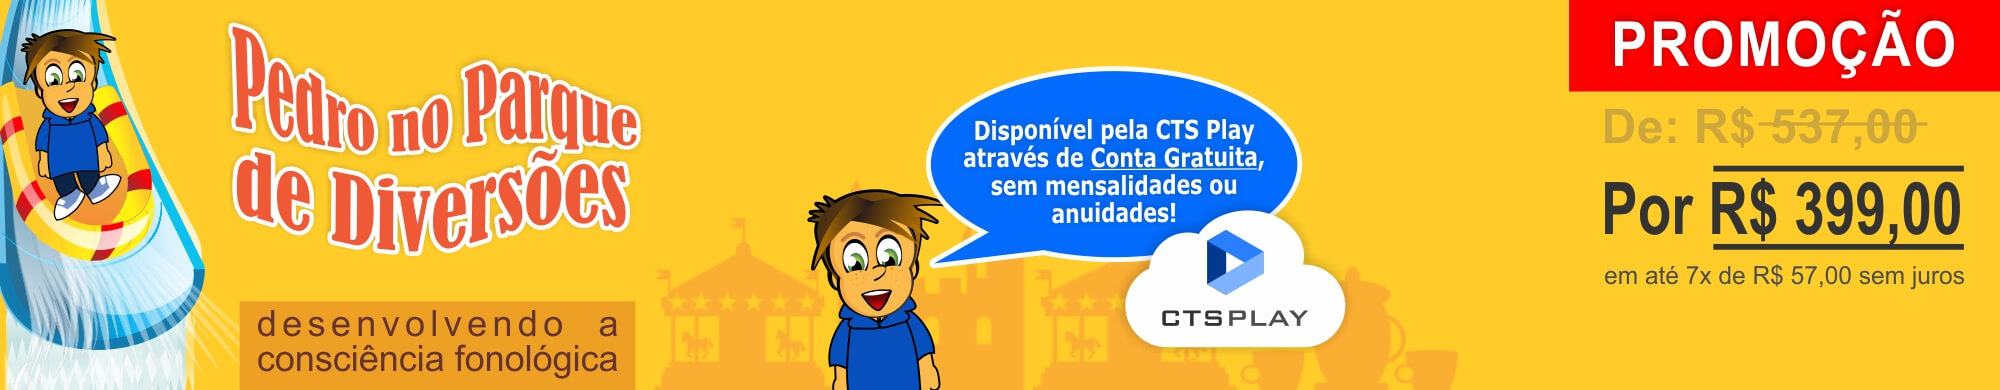 CTSPLAY